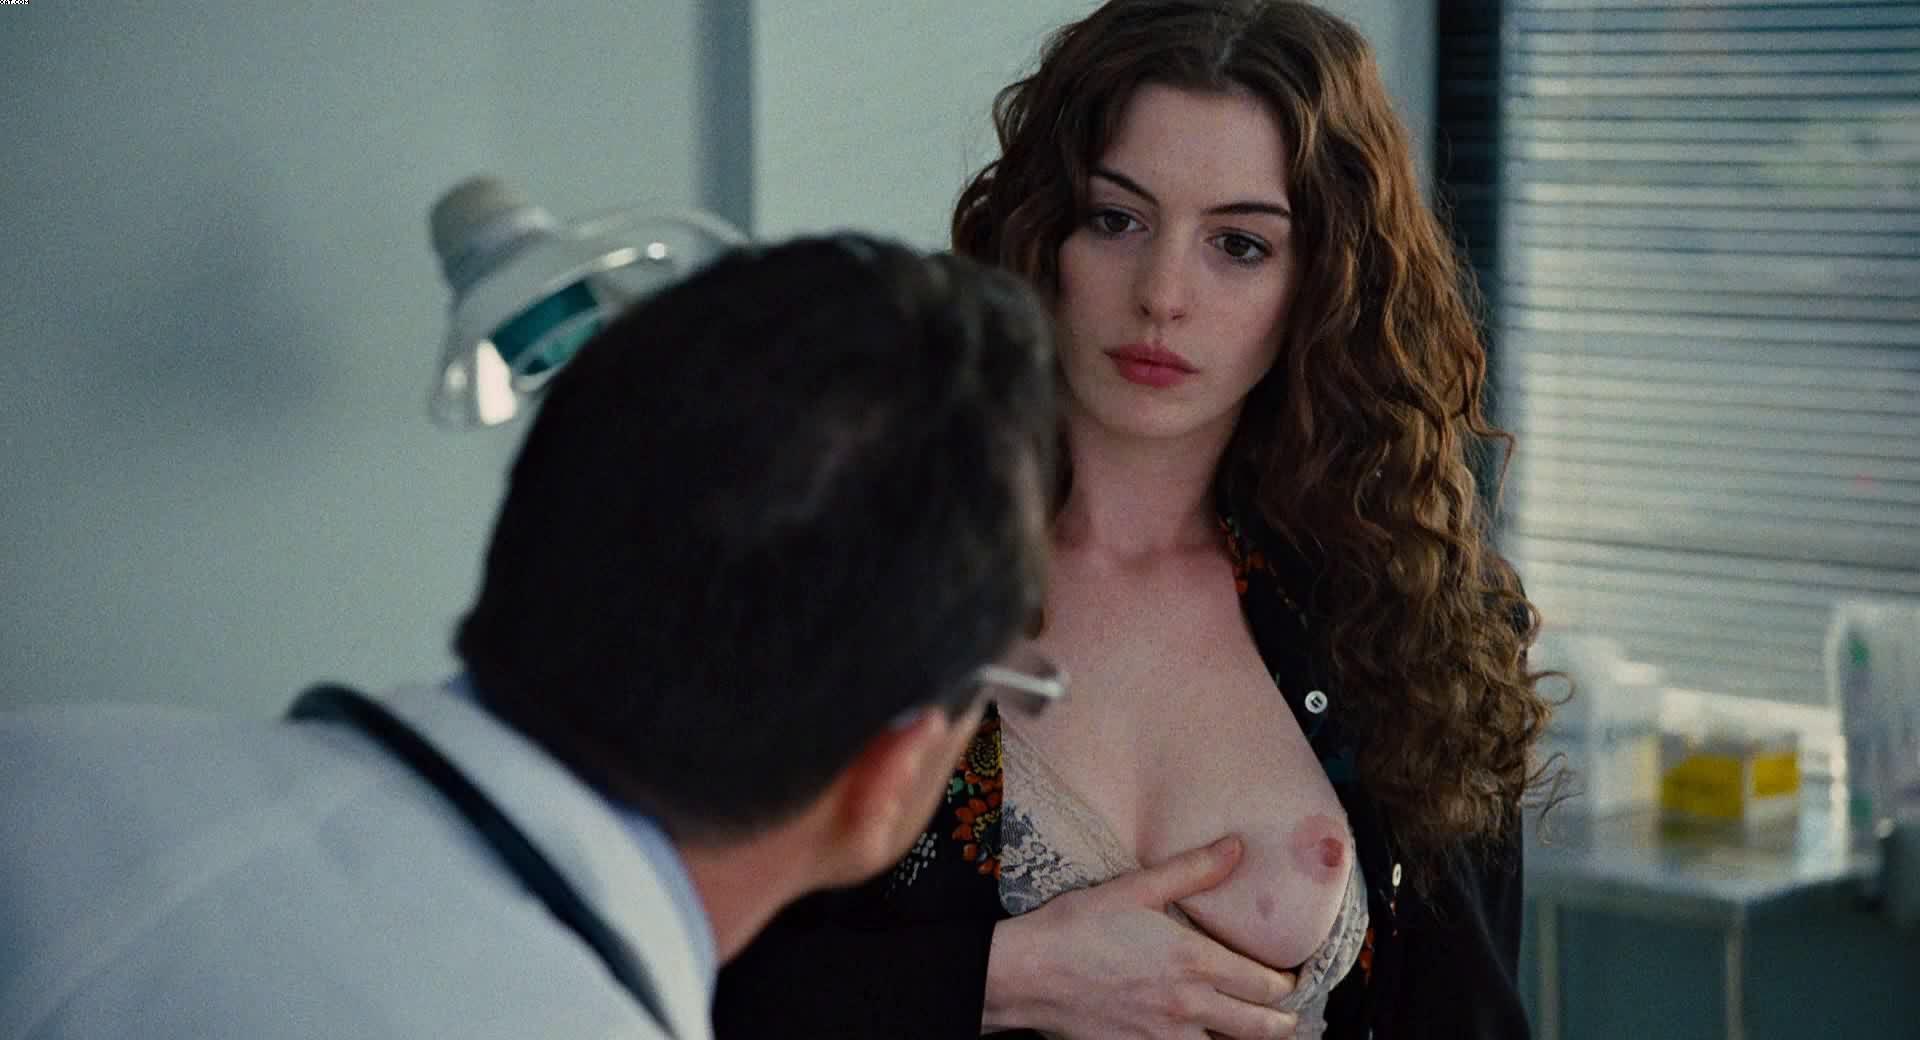 Anne hathaway nude celeb pics